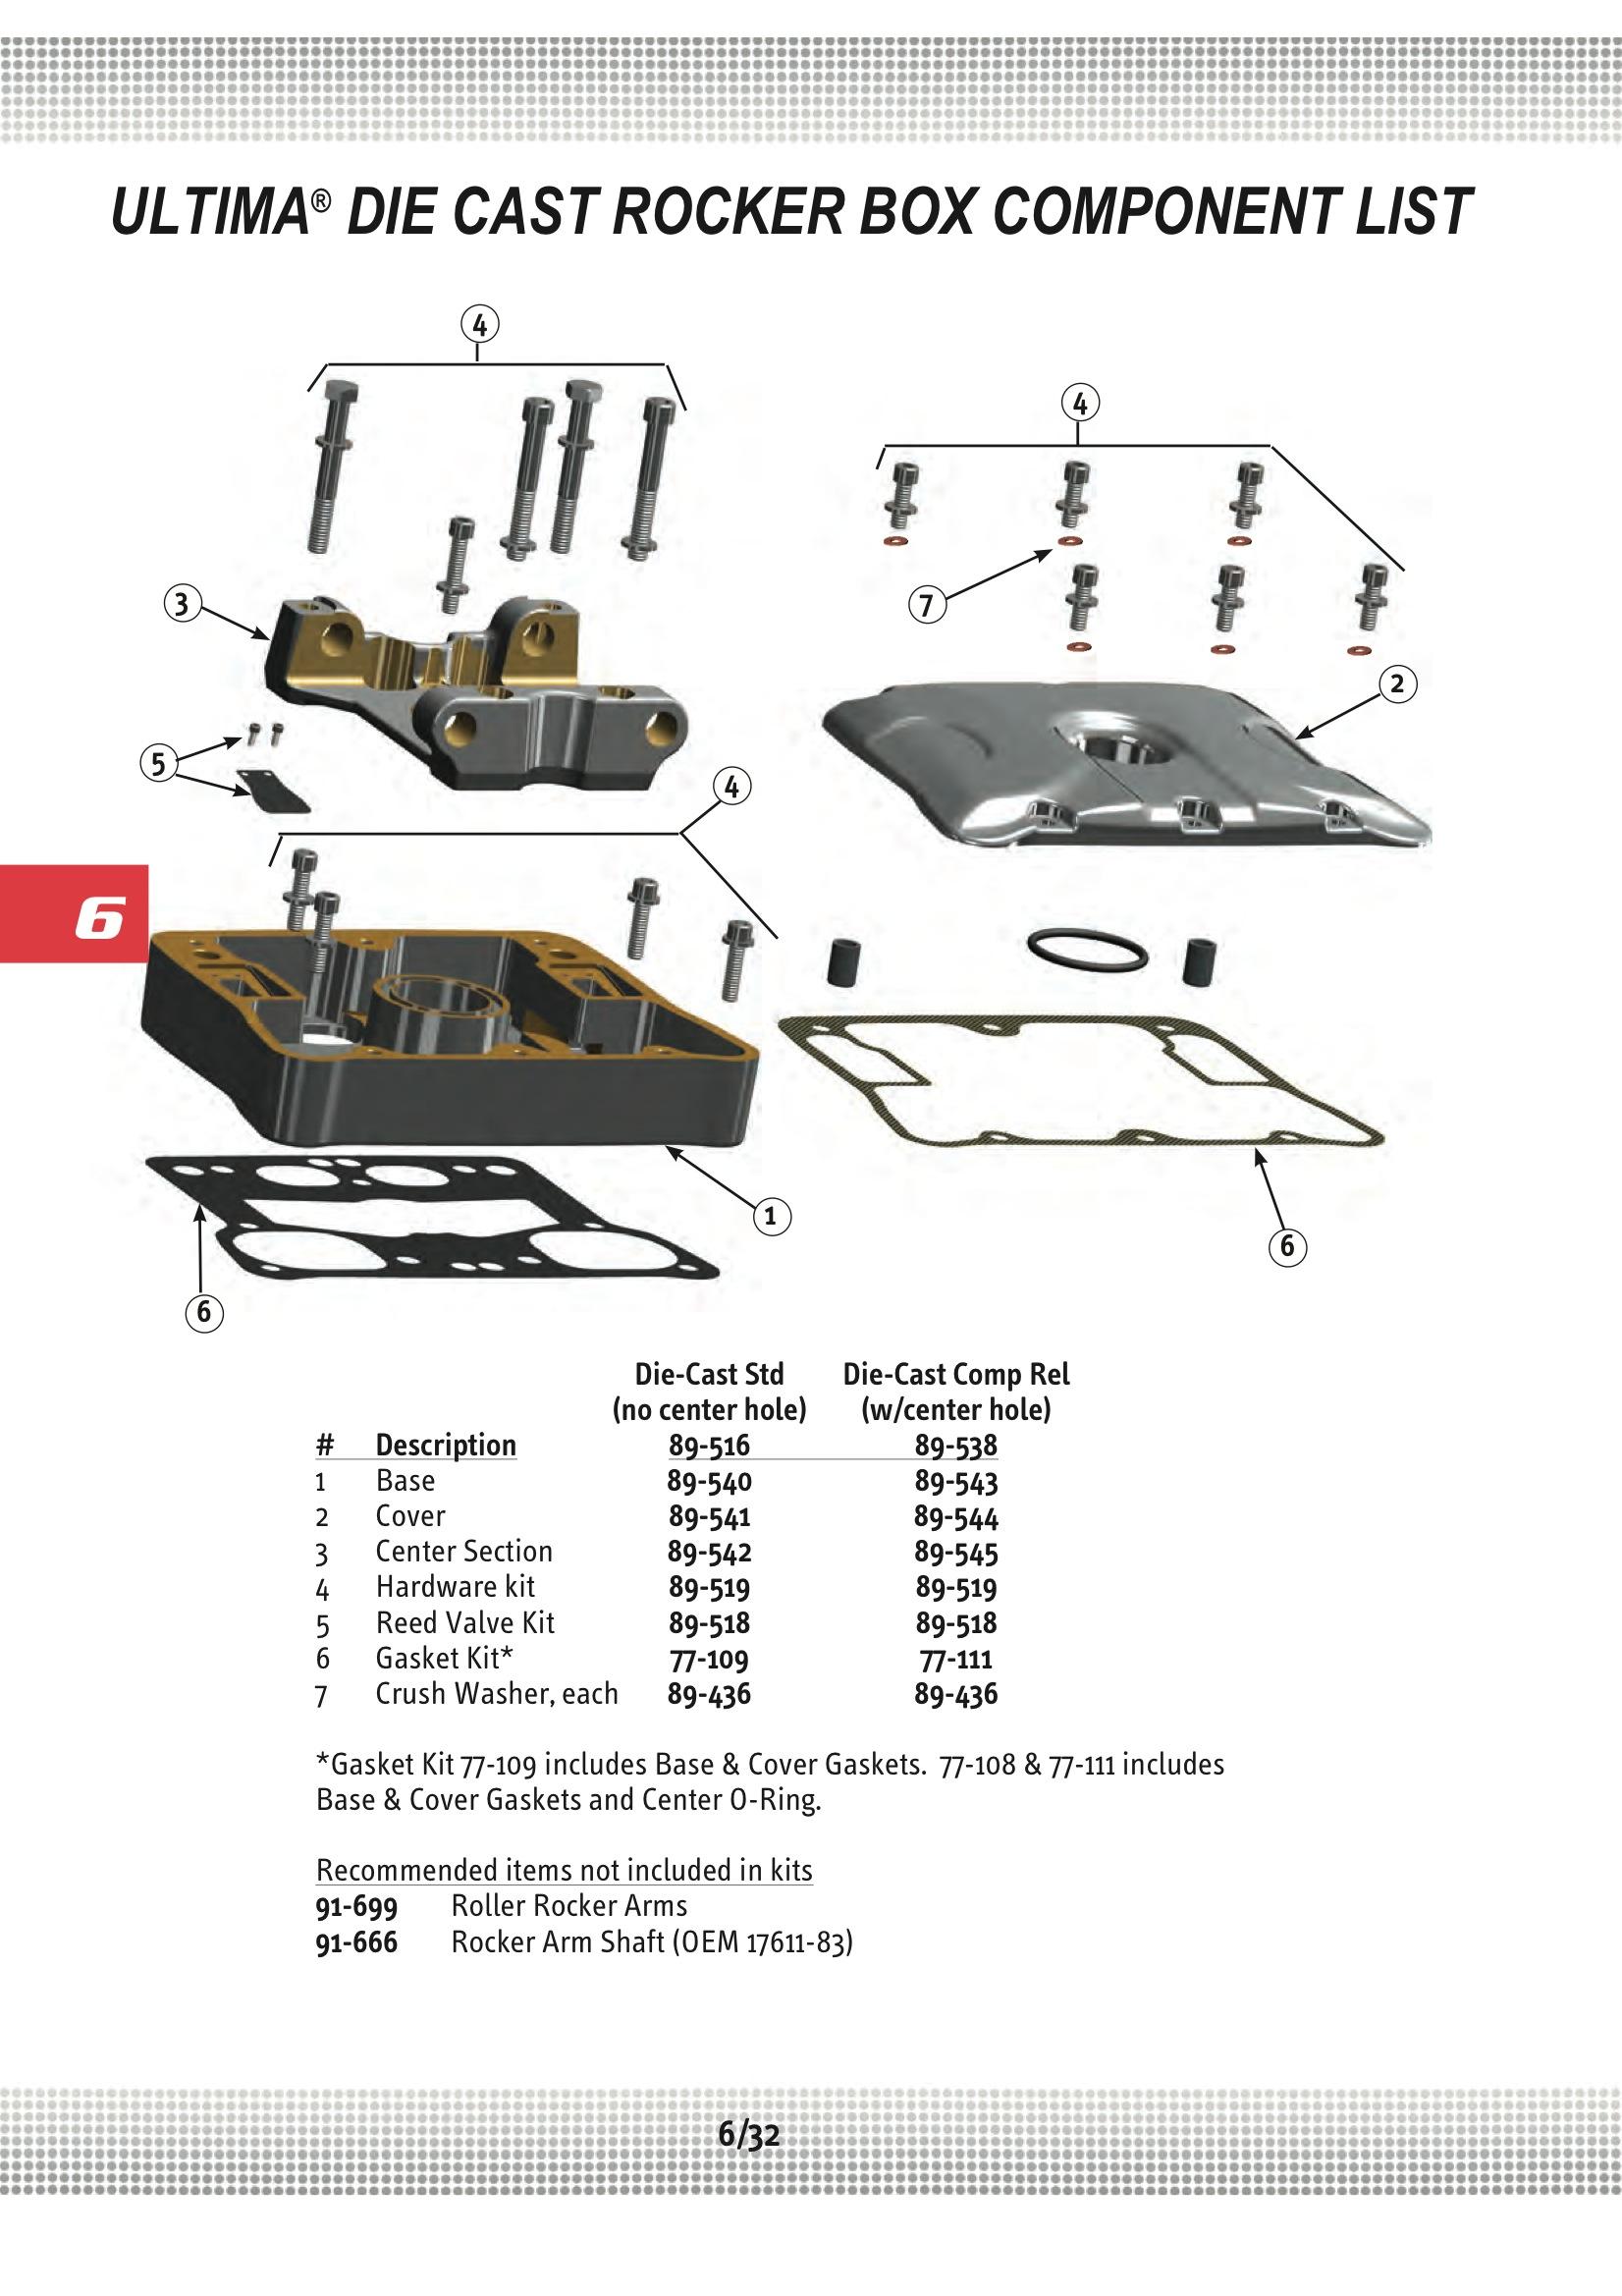 Ultima ROCKER BOX HARDWARE KIT Midwest 89519